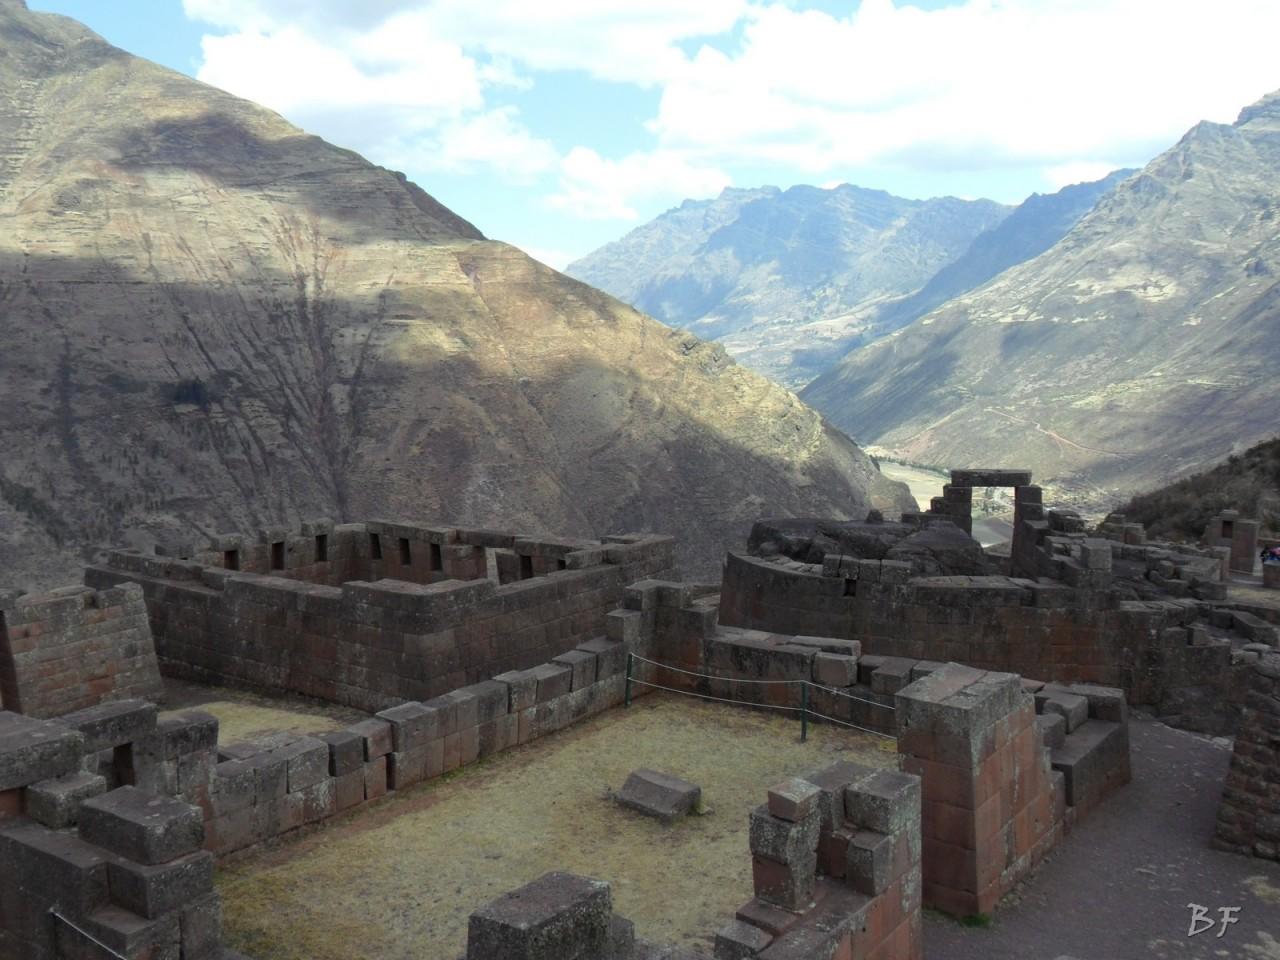 Mura-Poligonali-Megaliti-Altari-Rupestri-Pisac-Cusco-Perù-42